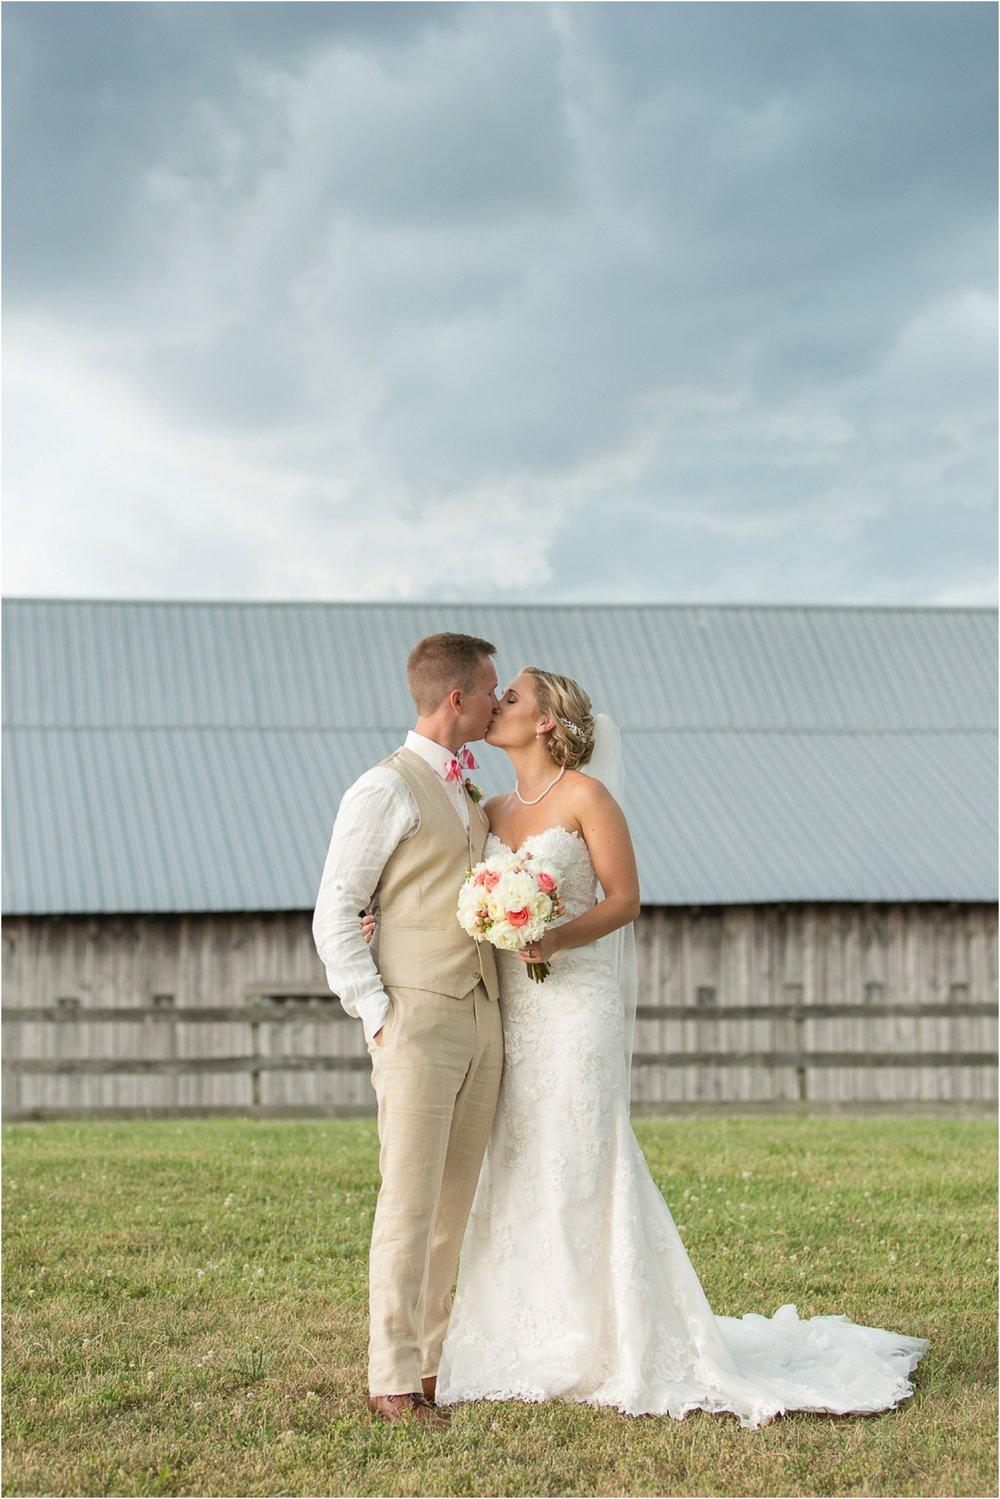 Celebrations-at-the-bay-wedding-photos-52.jpg